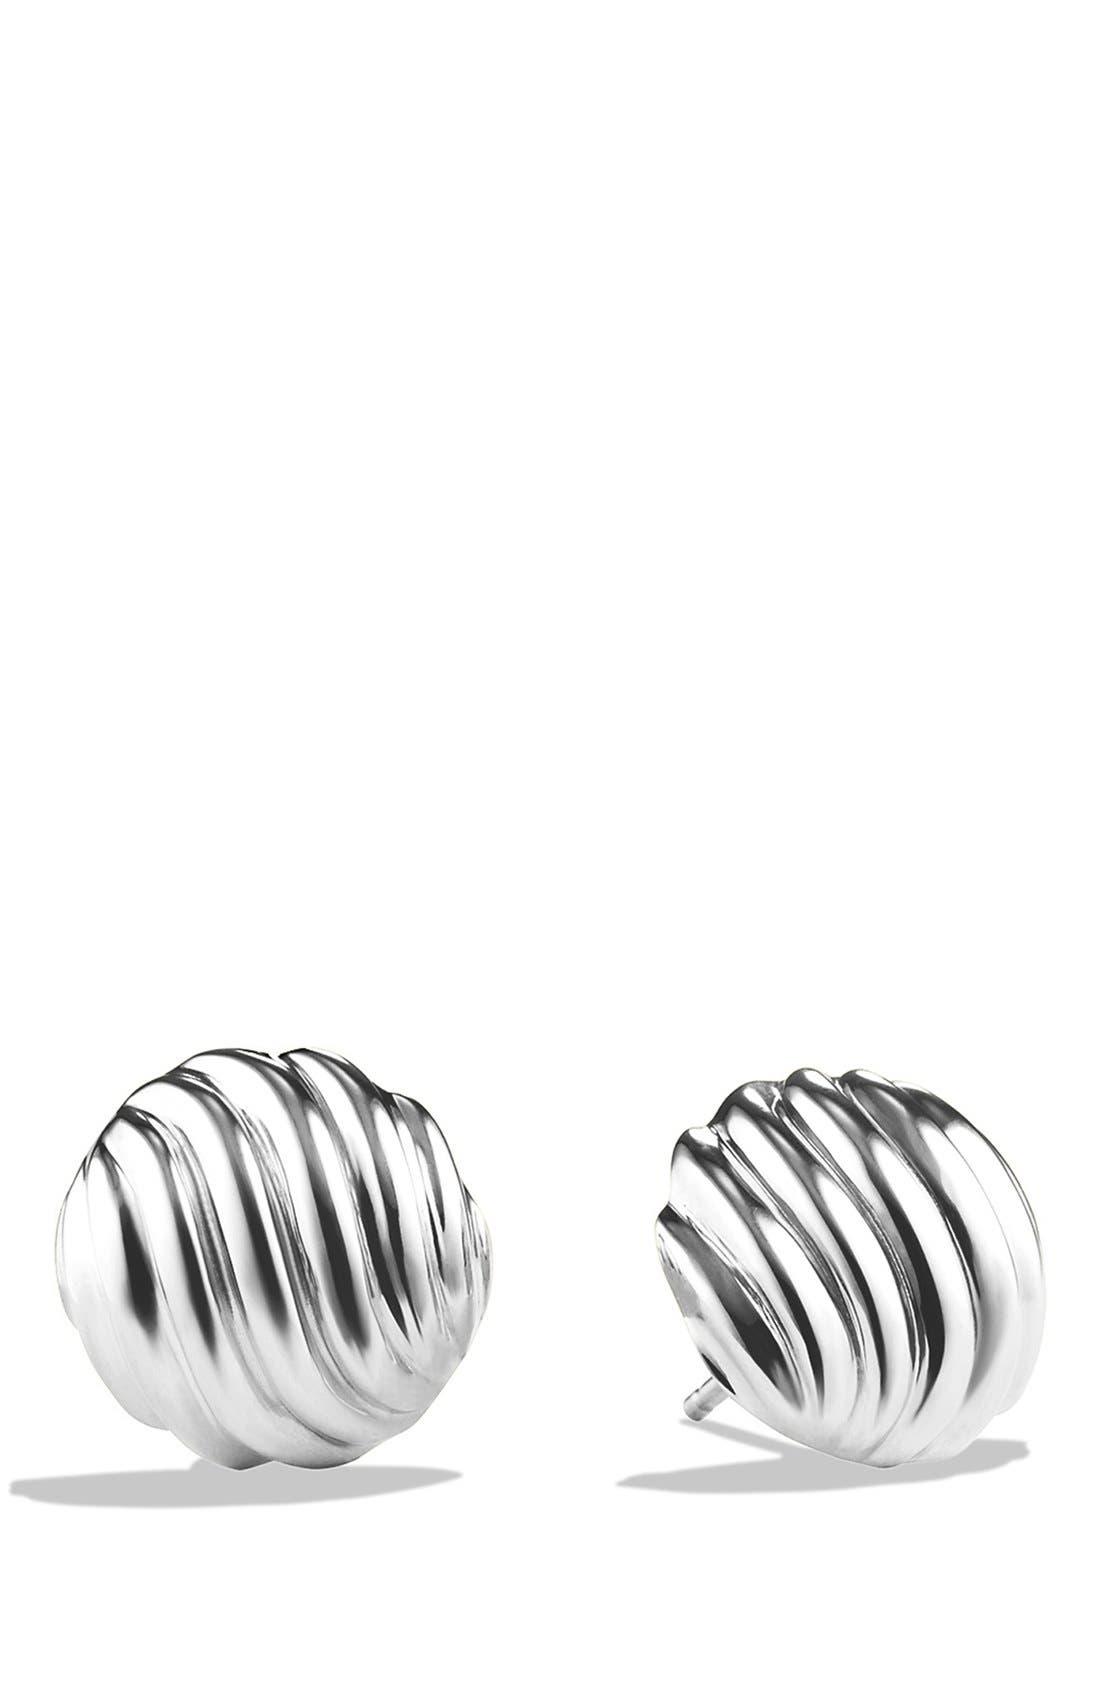 DAVID YURMAN 'Sculpted Cable' Earrings, Main, color, SILVER